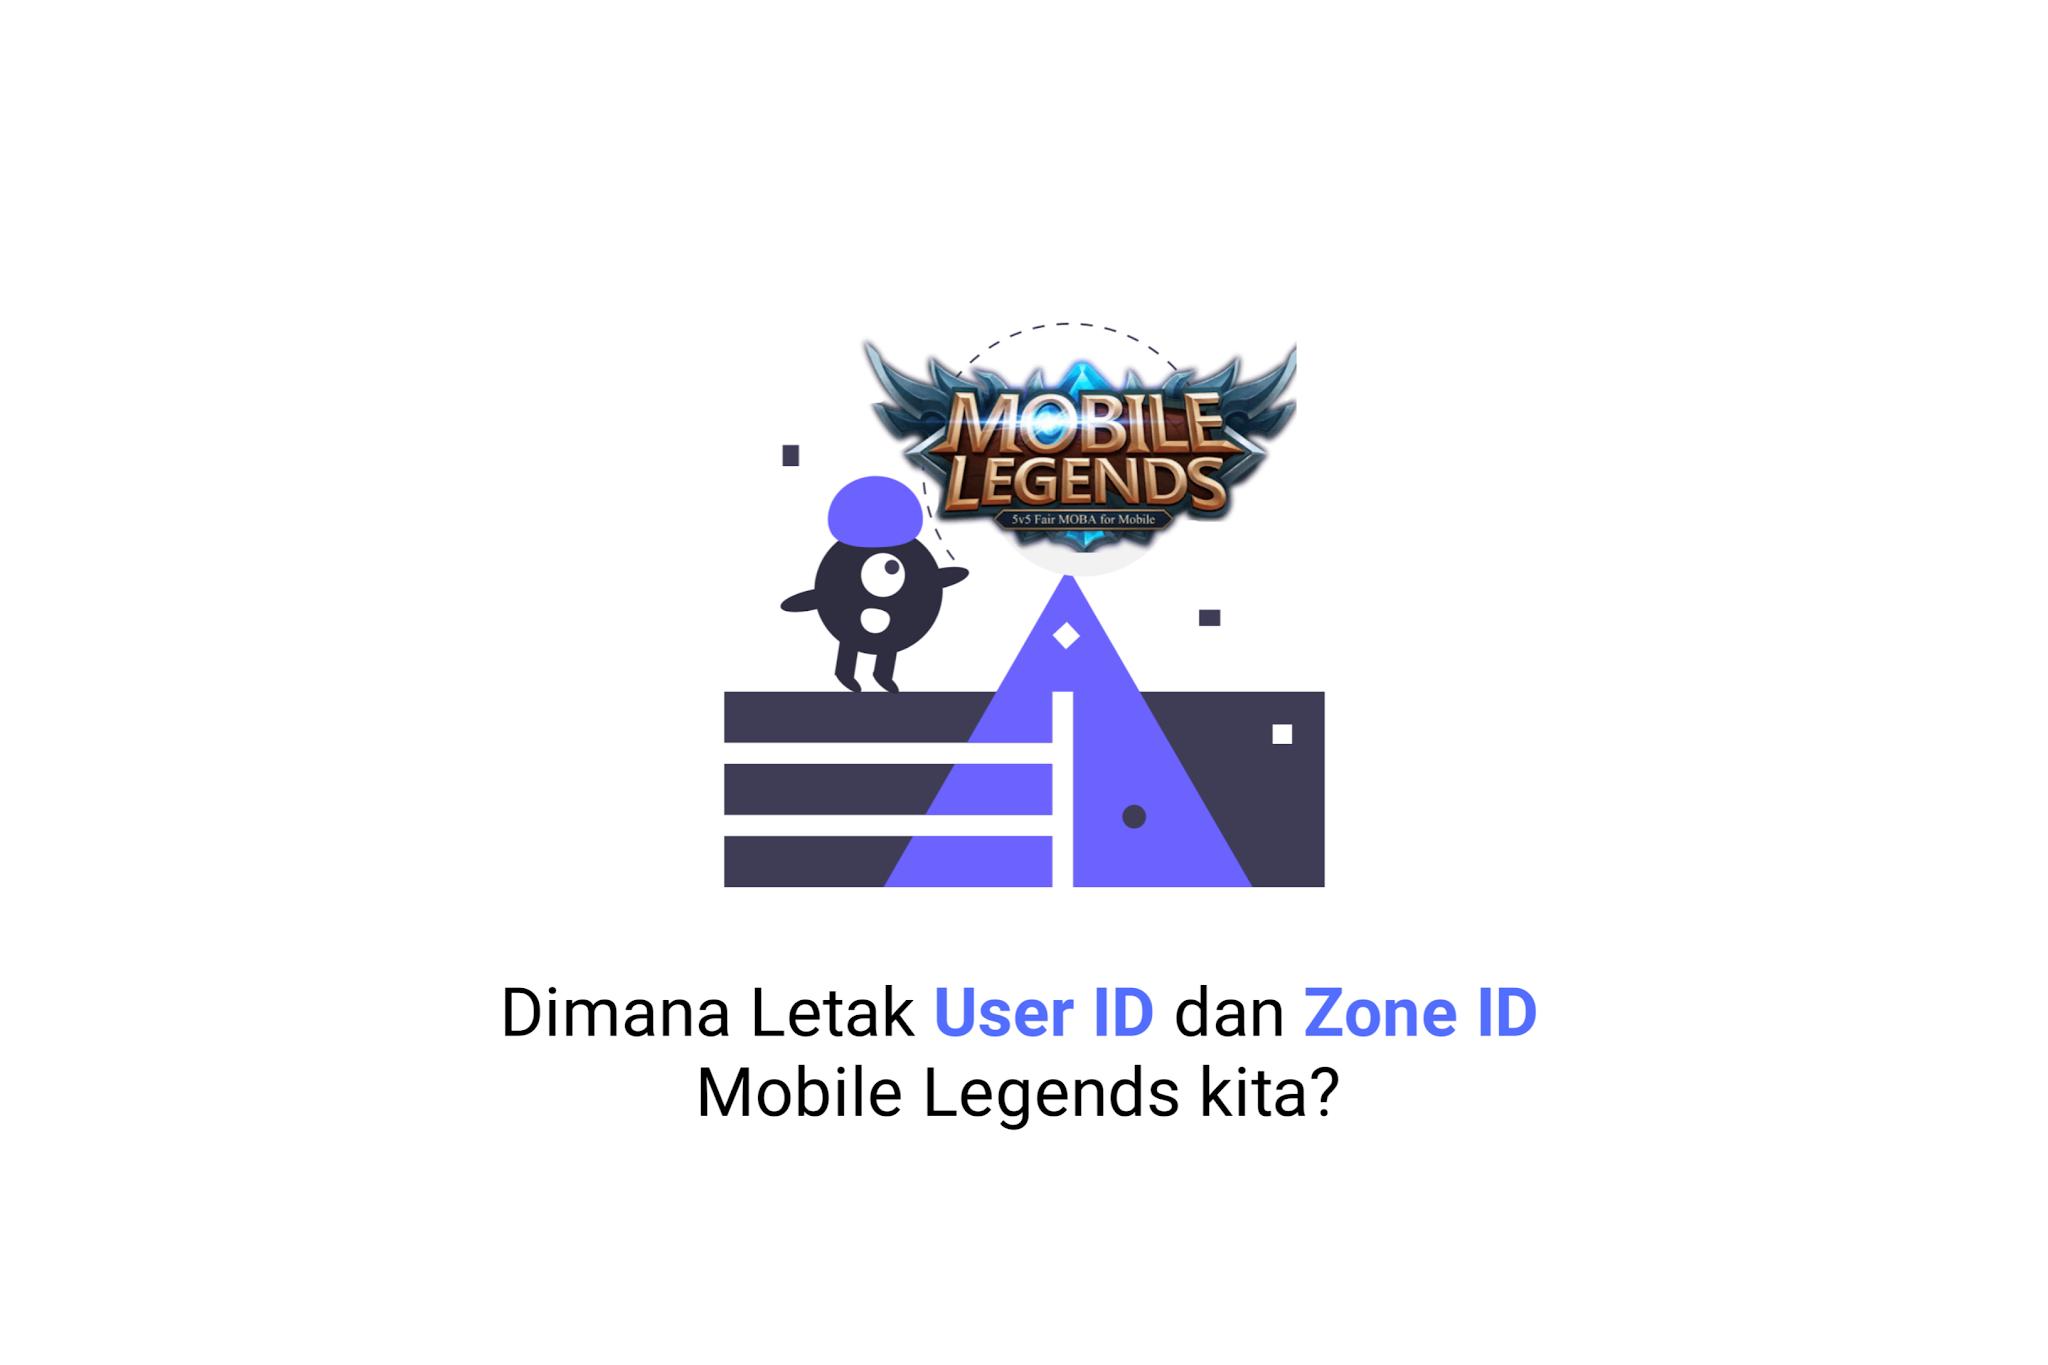 Dimana Letak User ID dan Zone ID Mobile Legends kita?